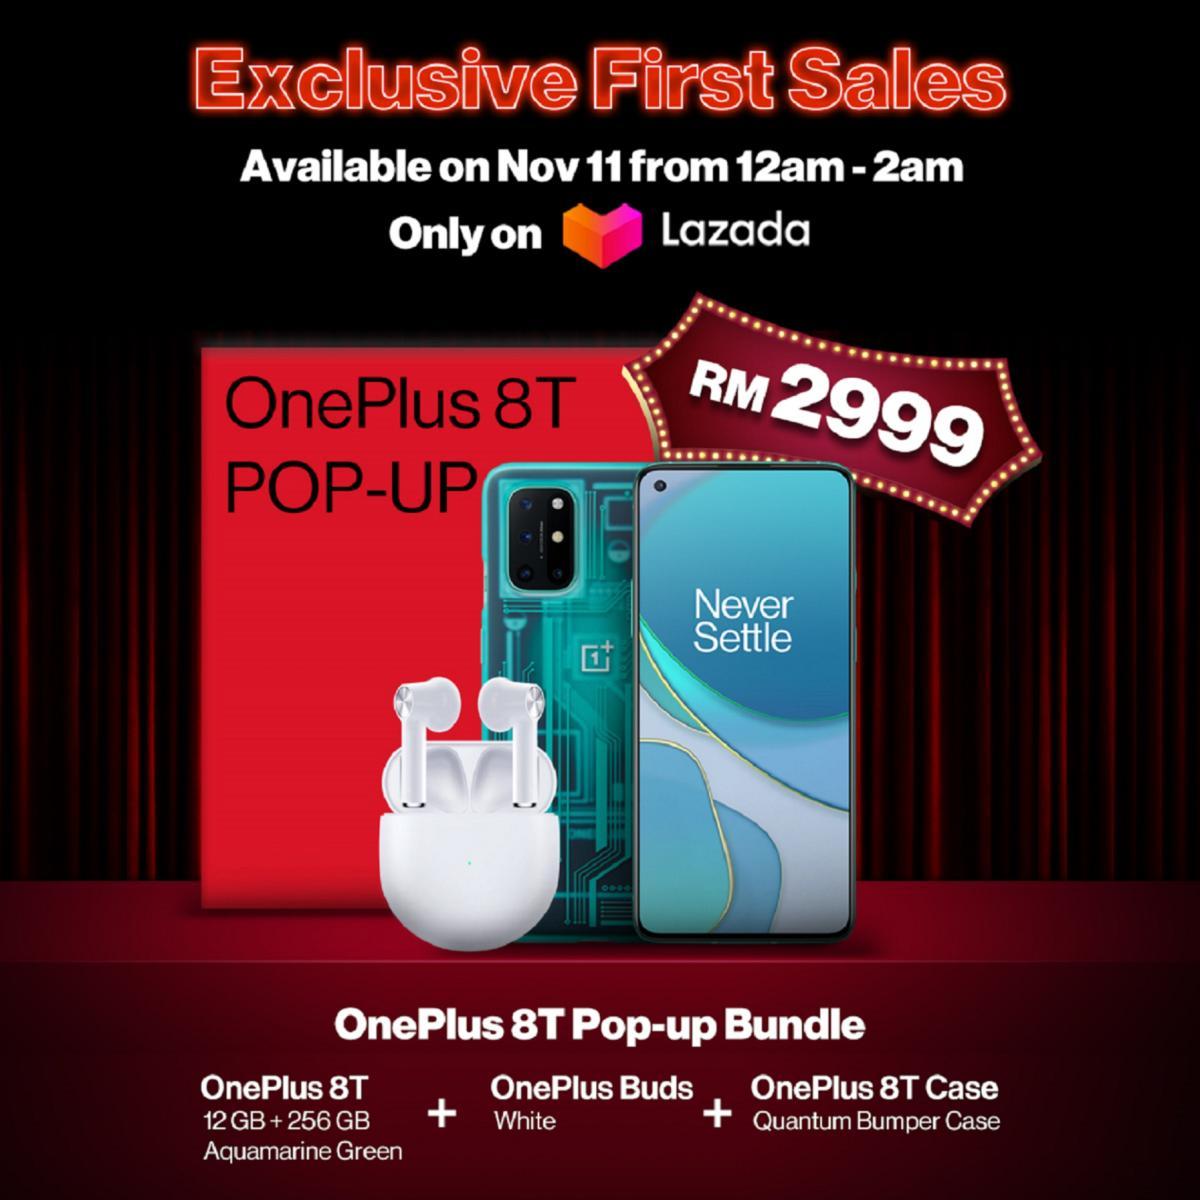 5. OnePlus 8T Pop-up Bundle – RM2,999